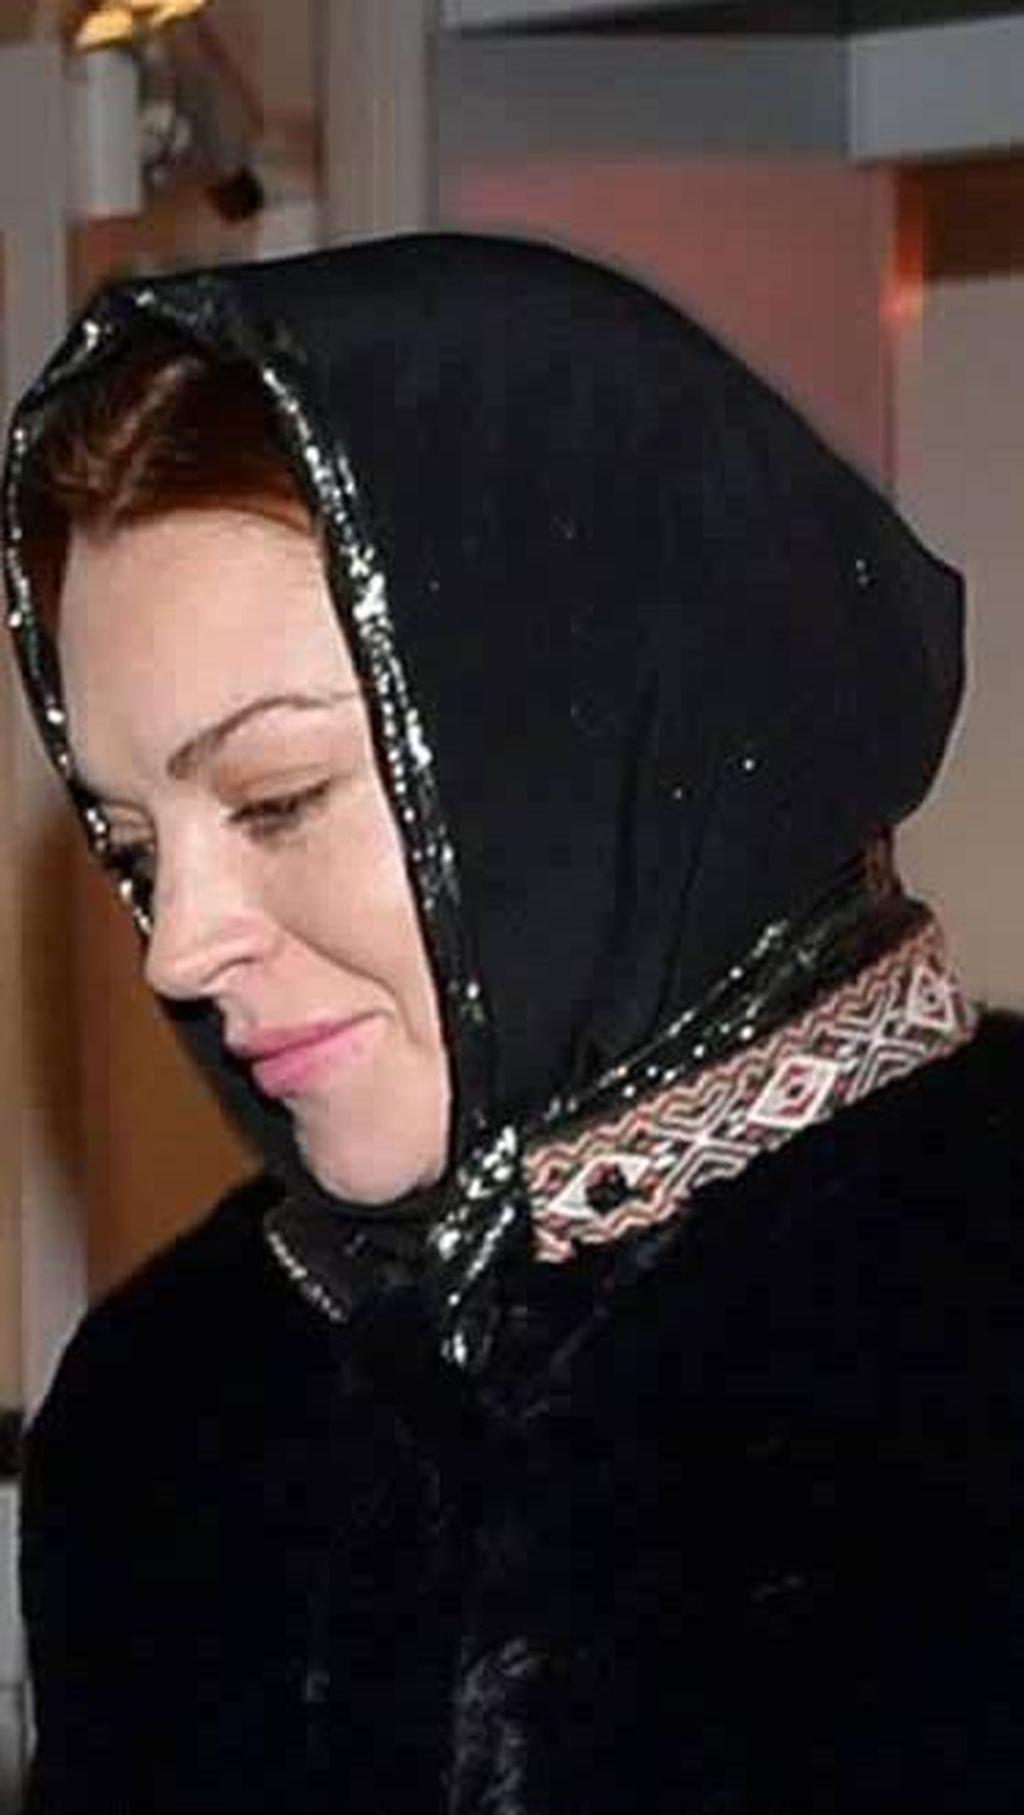 Lindsay Lohan Kerjasama dengan Desainer Hijab Rilis Busana Modest Wear?